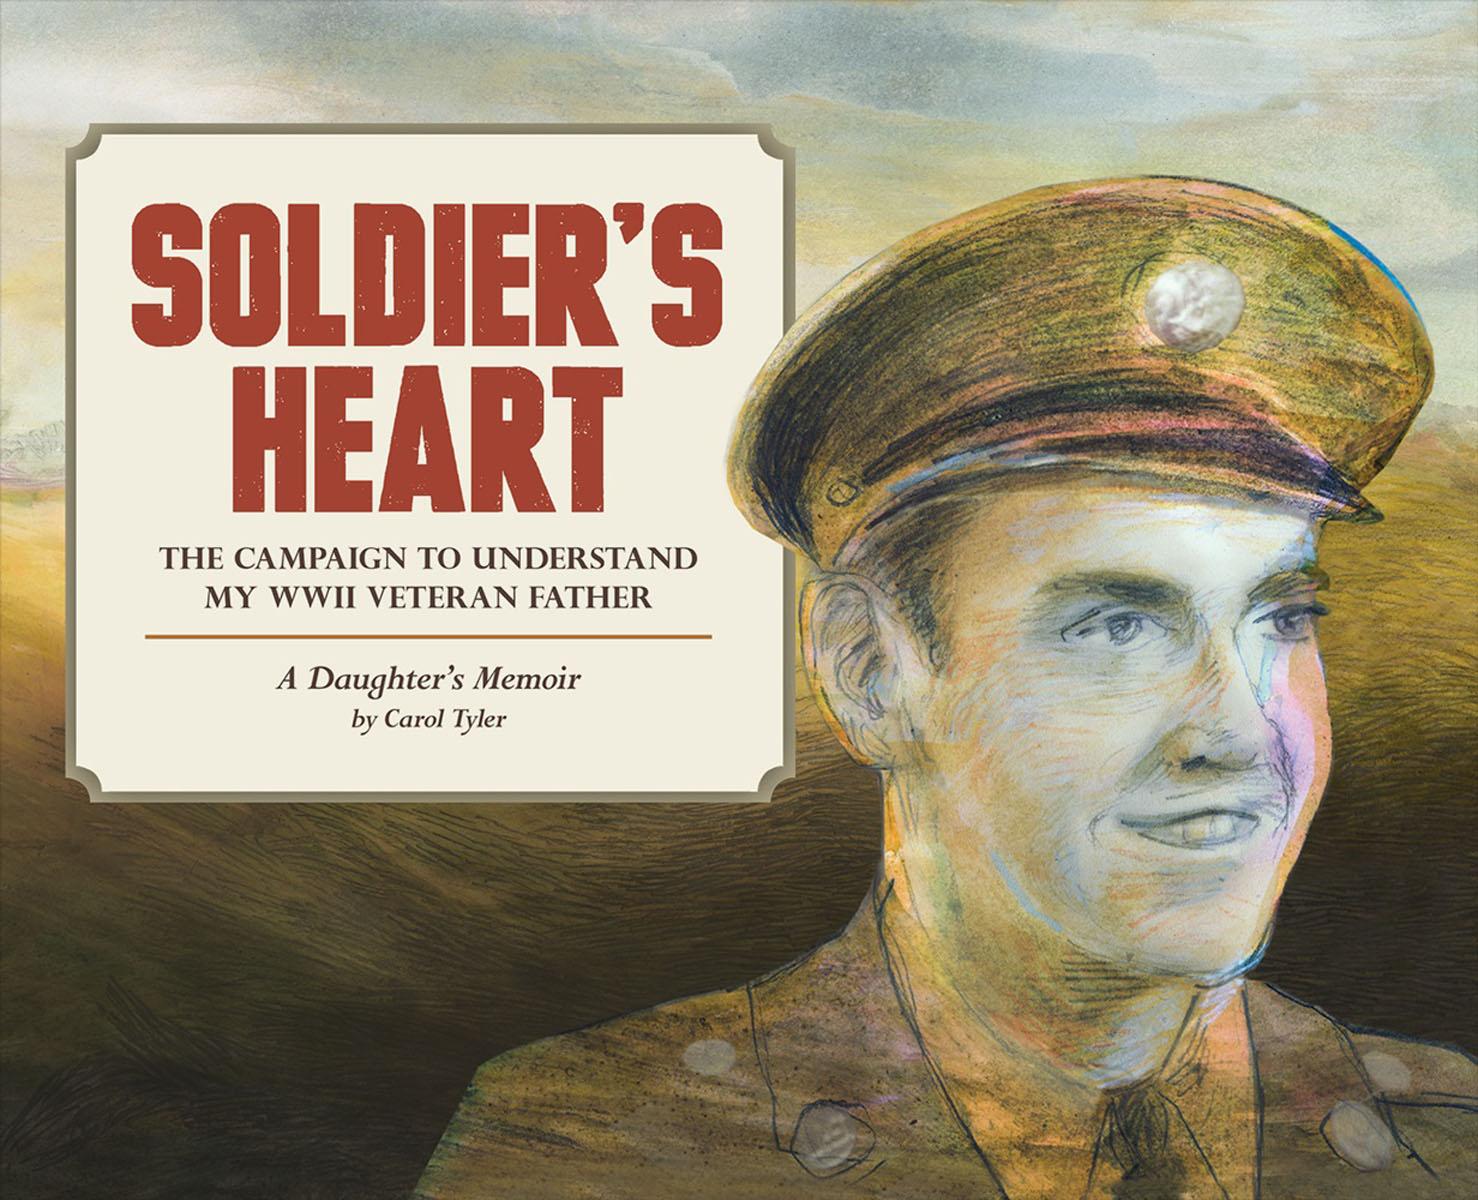 Soldier's Heart rain drops in her heart